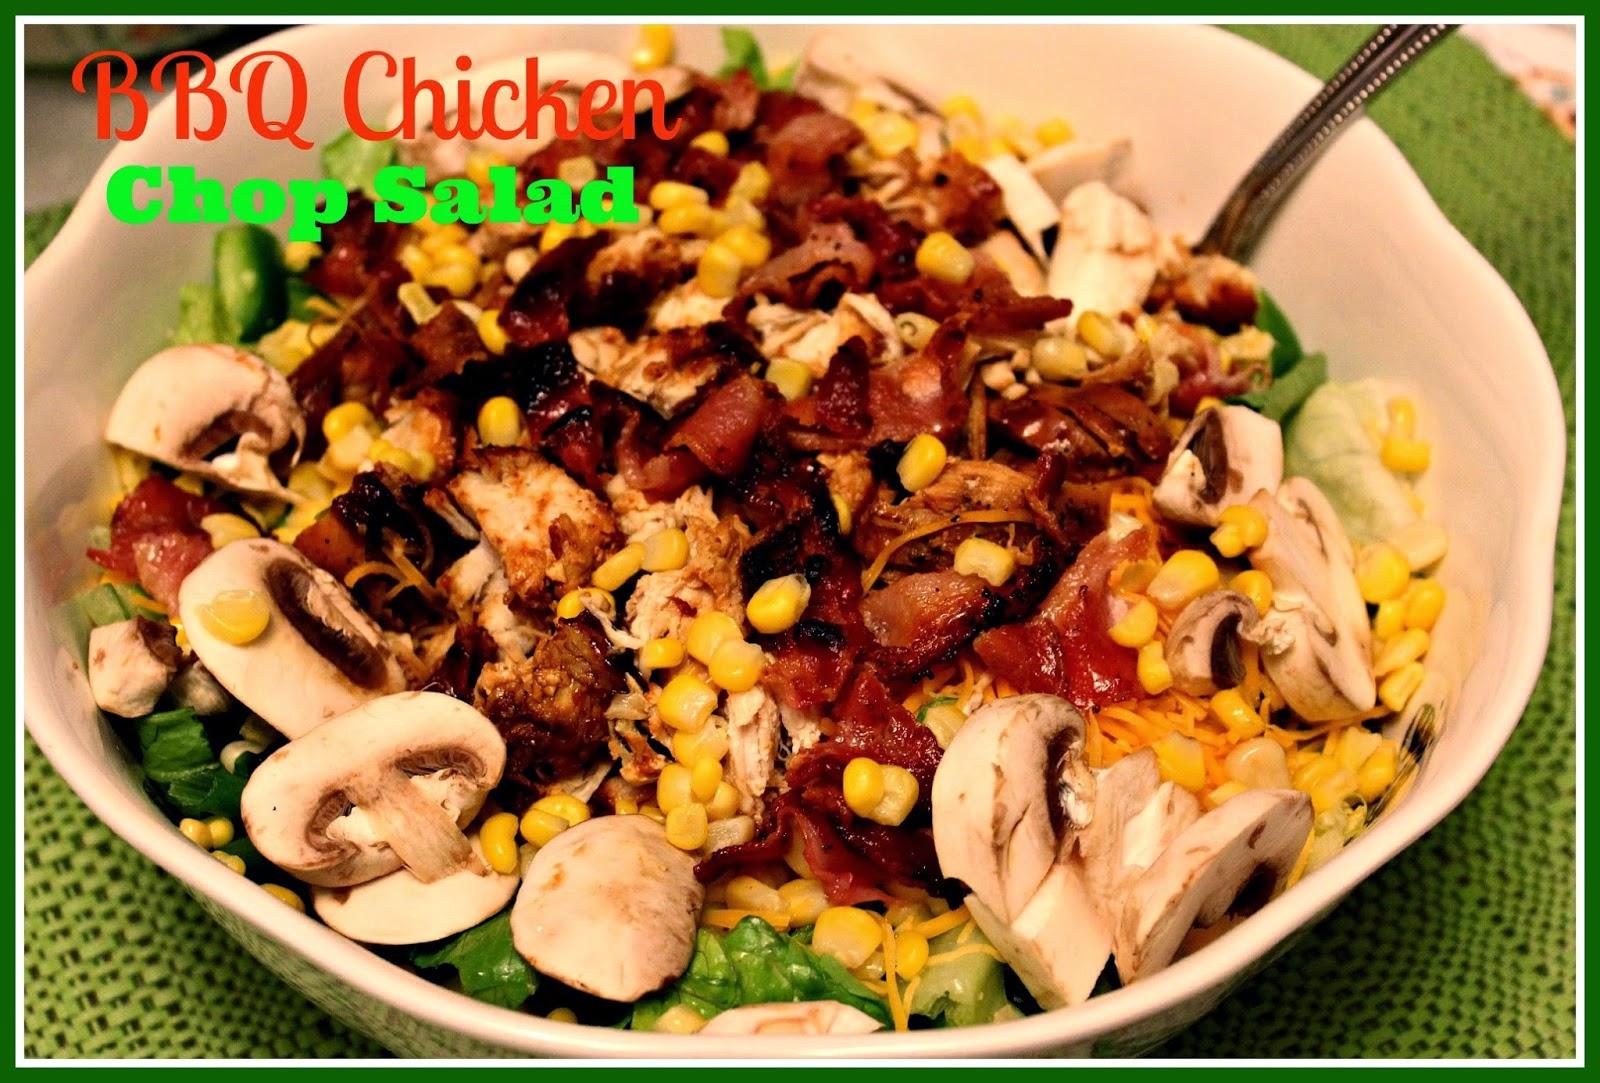 Sweet Tea and Cornbread: BBQ Chicken Chop Salad!